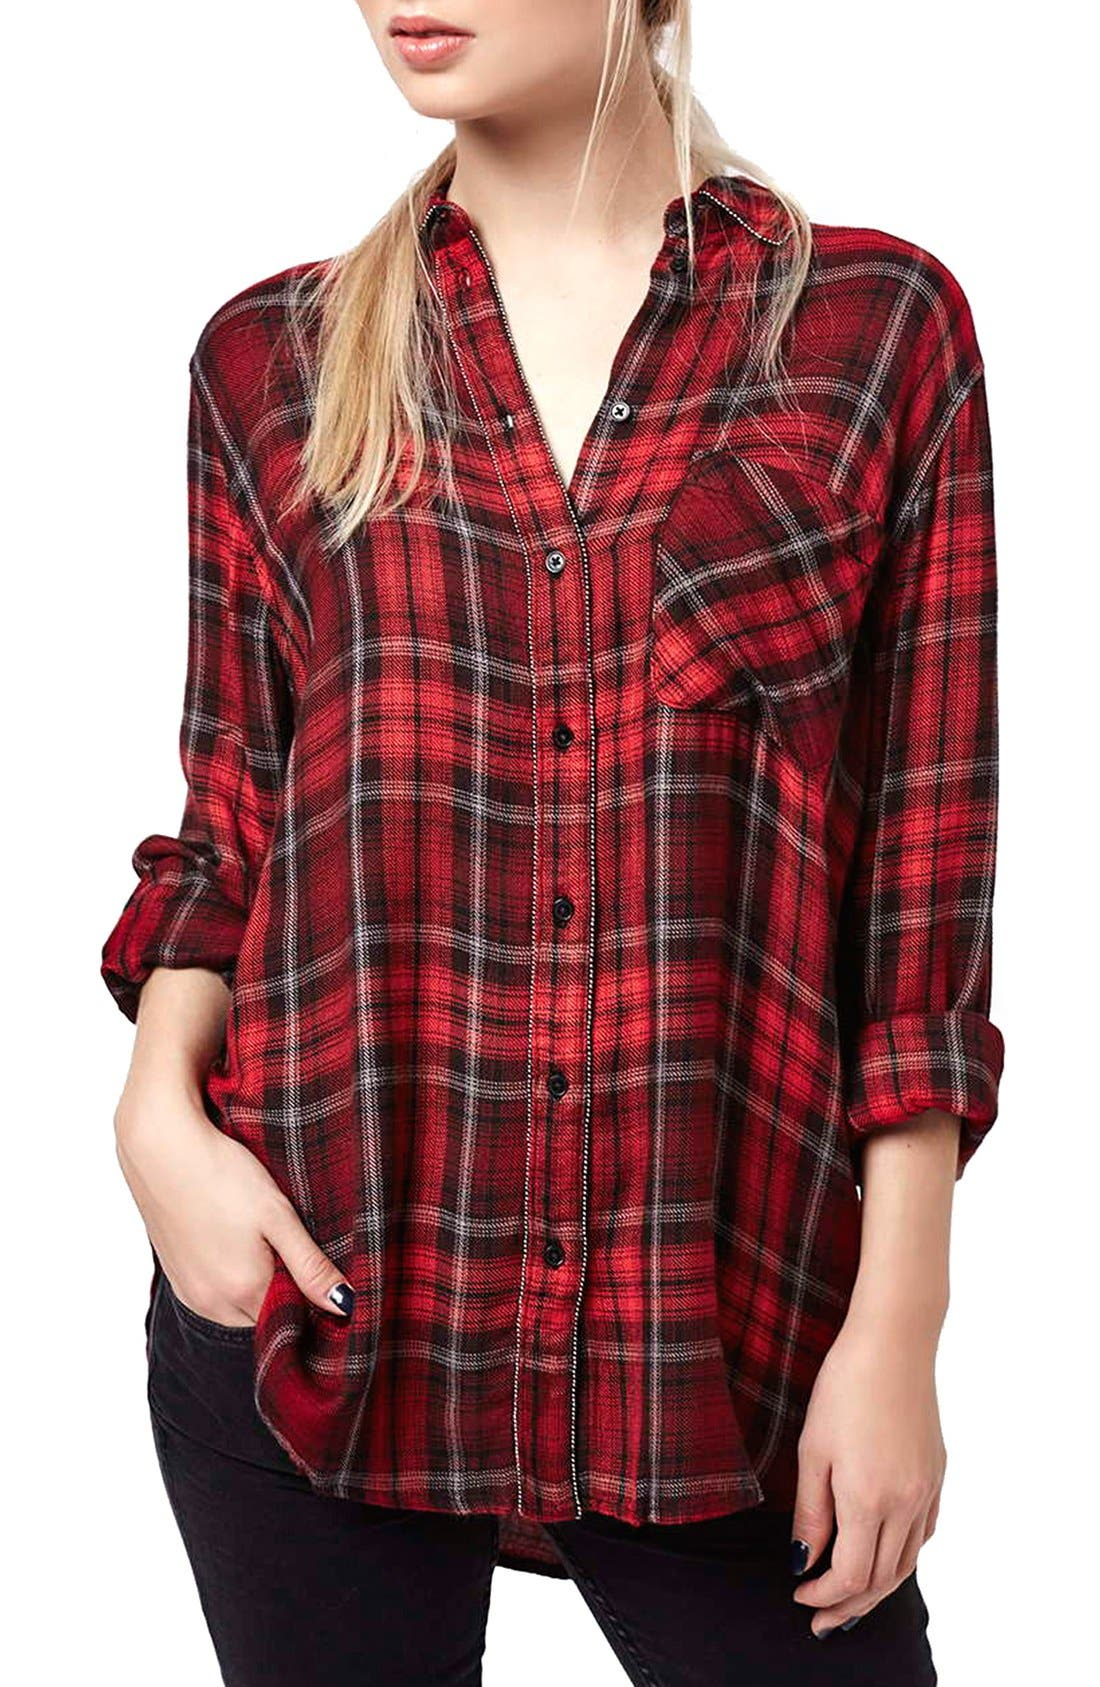 Alternate Image 1 Selected - Topshop 'Ali' Beaded Plaid Shirt